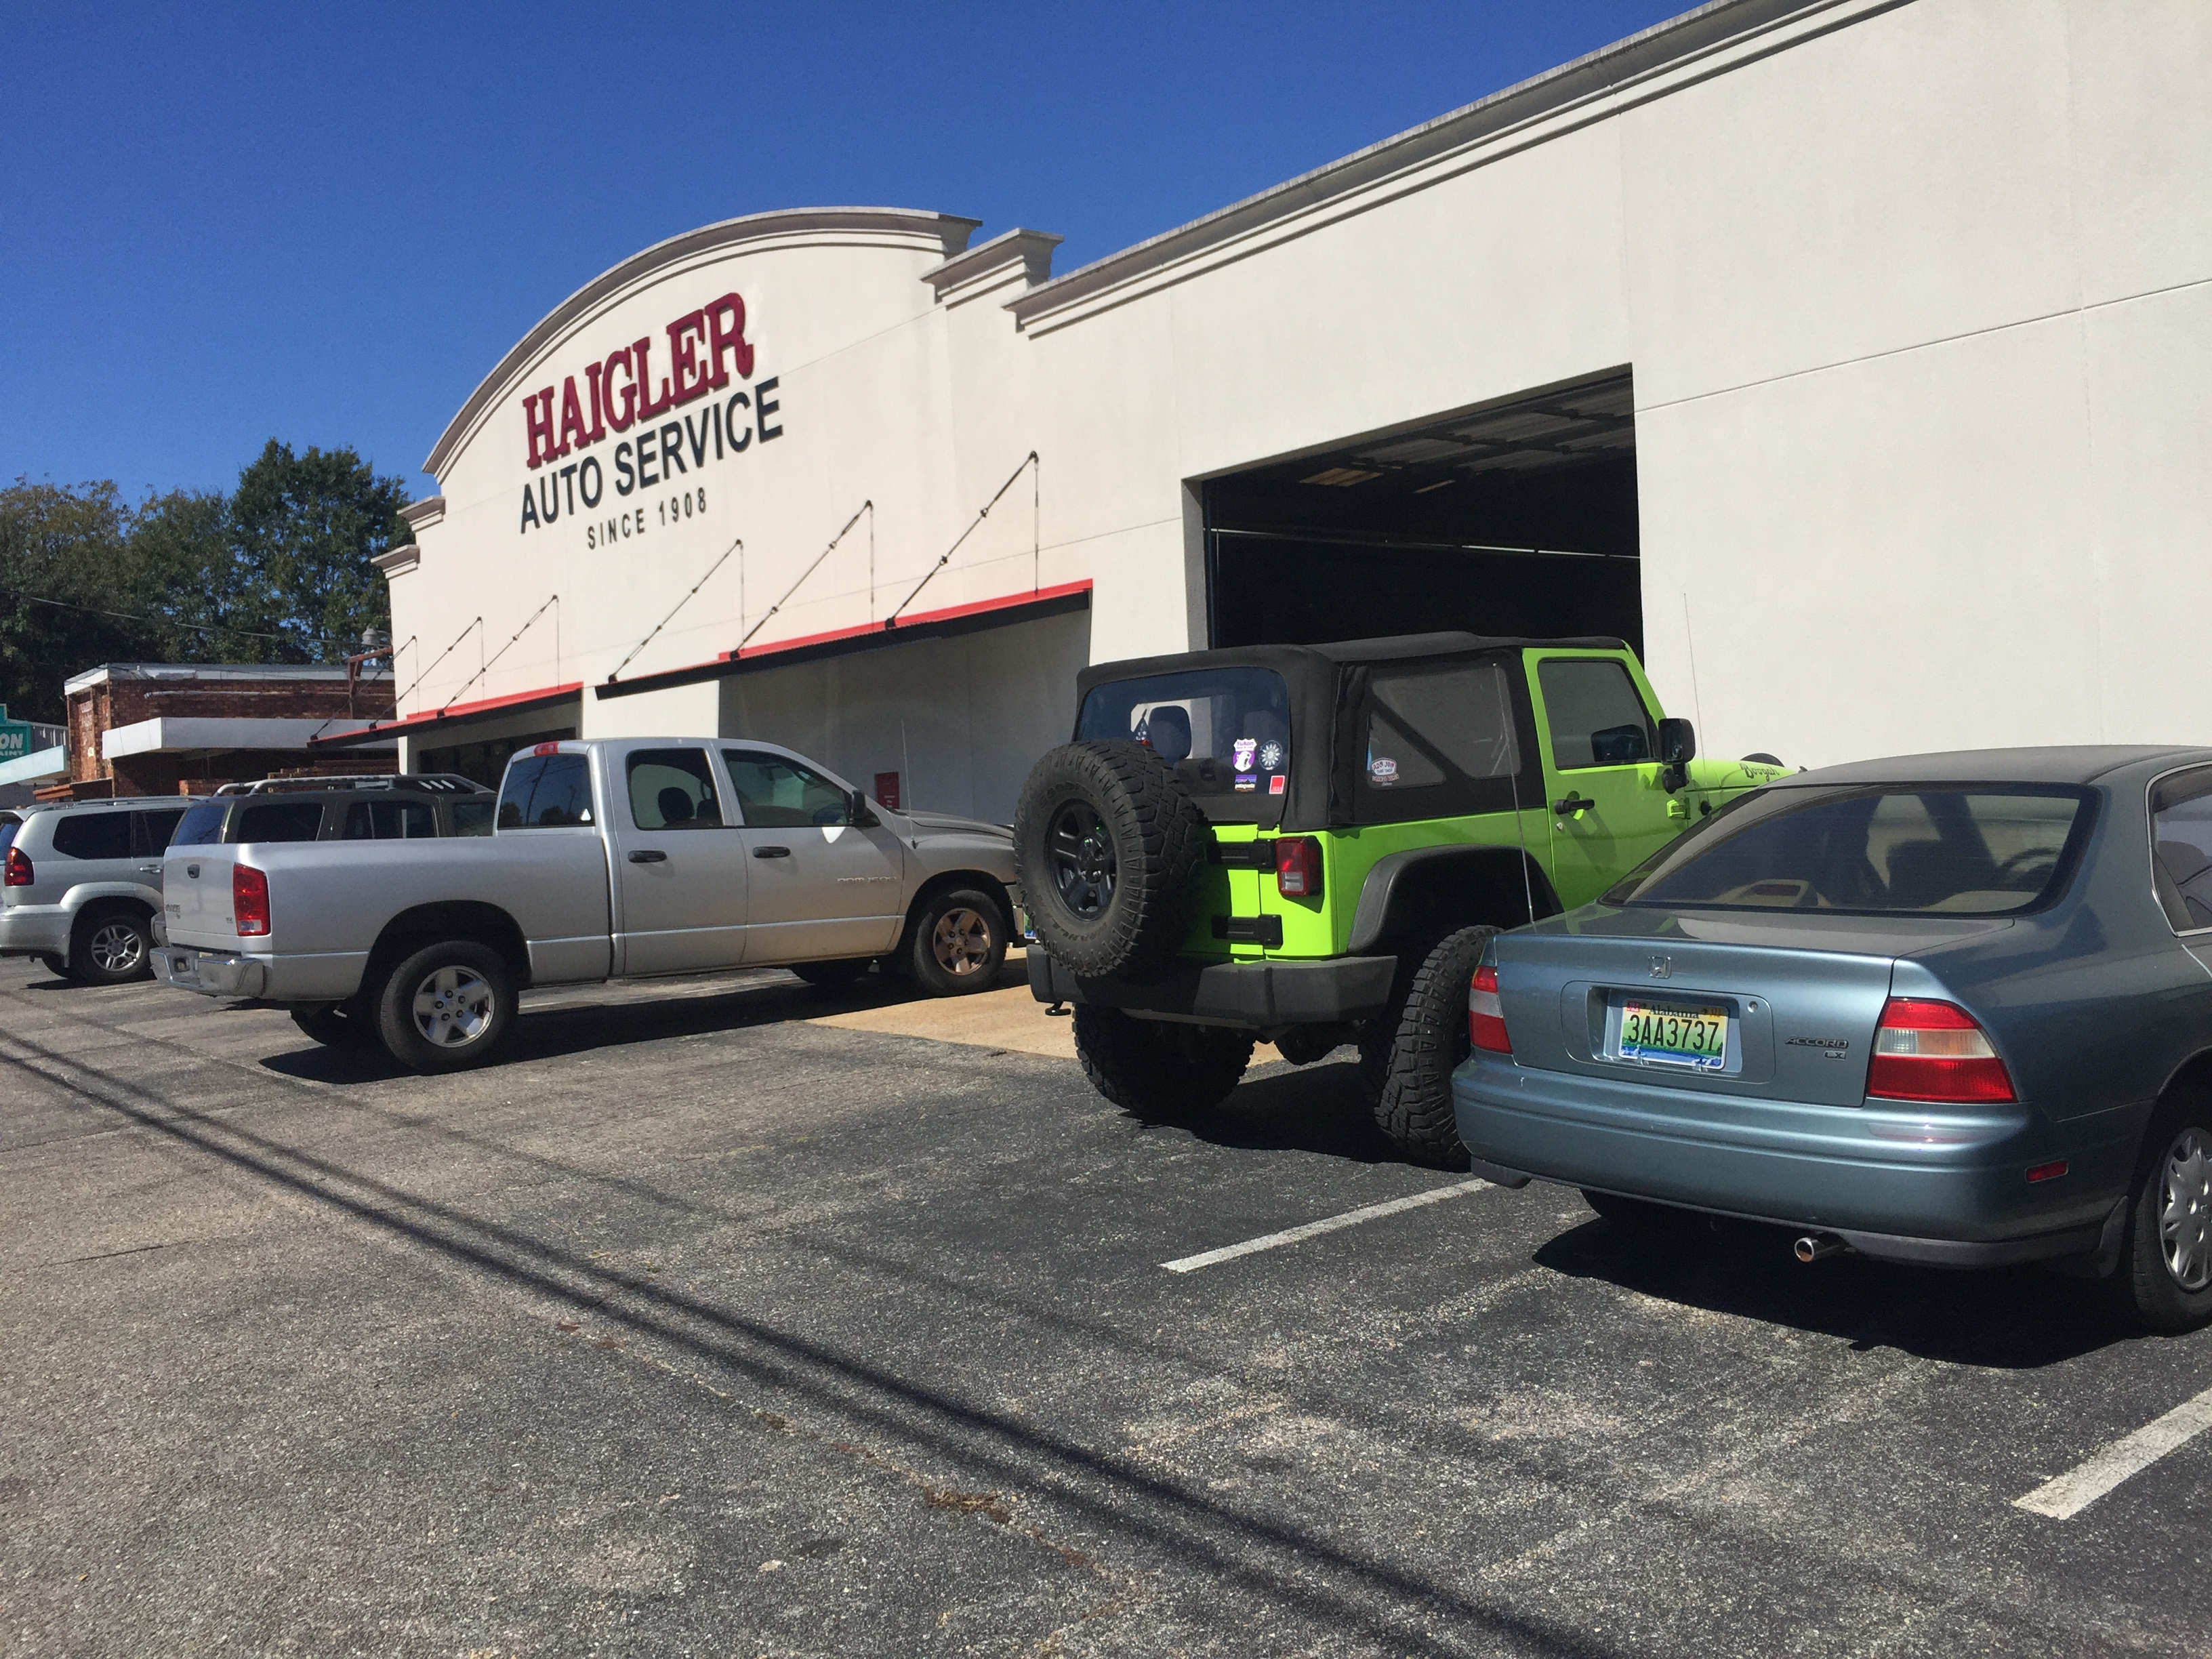 Haigler Auto Services image 7